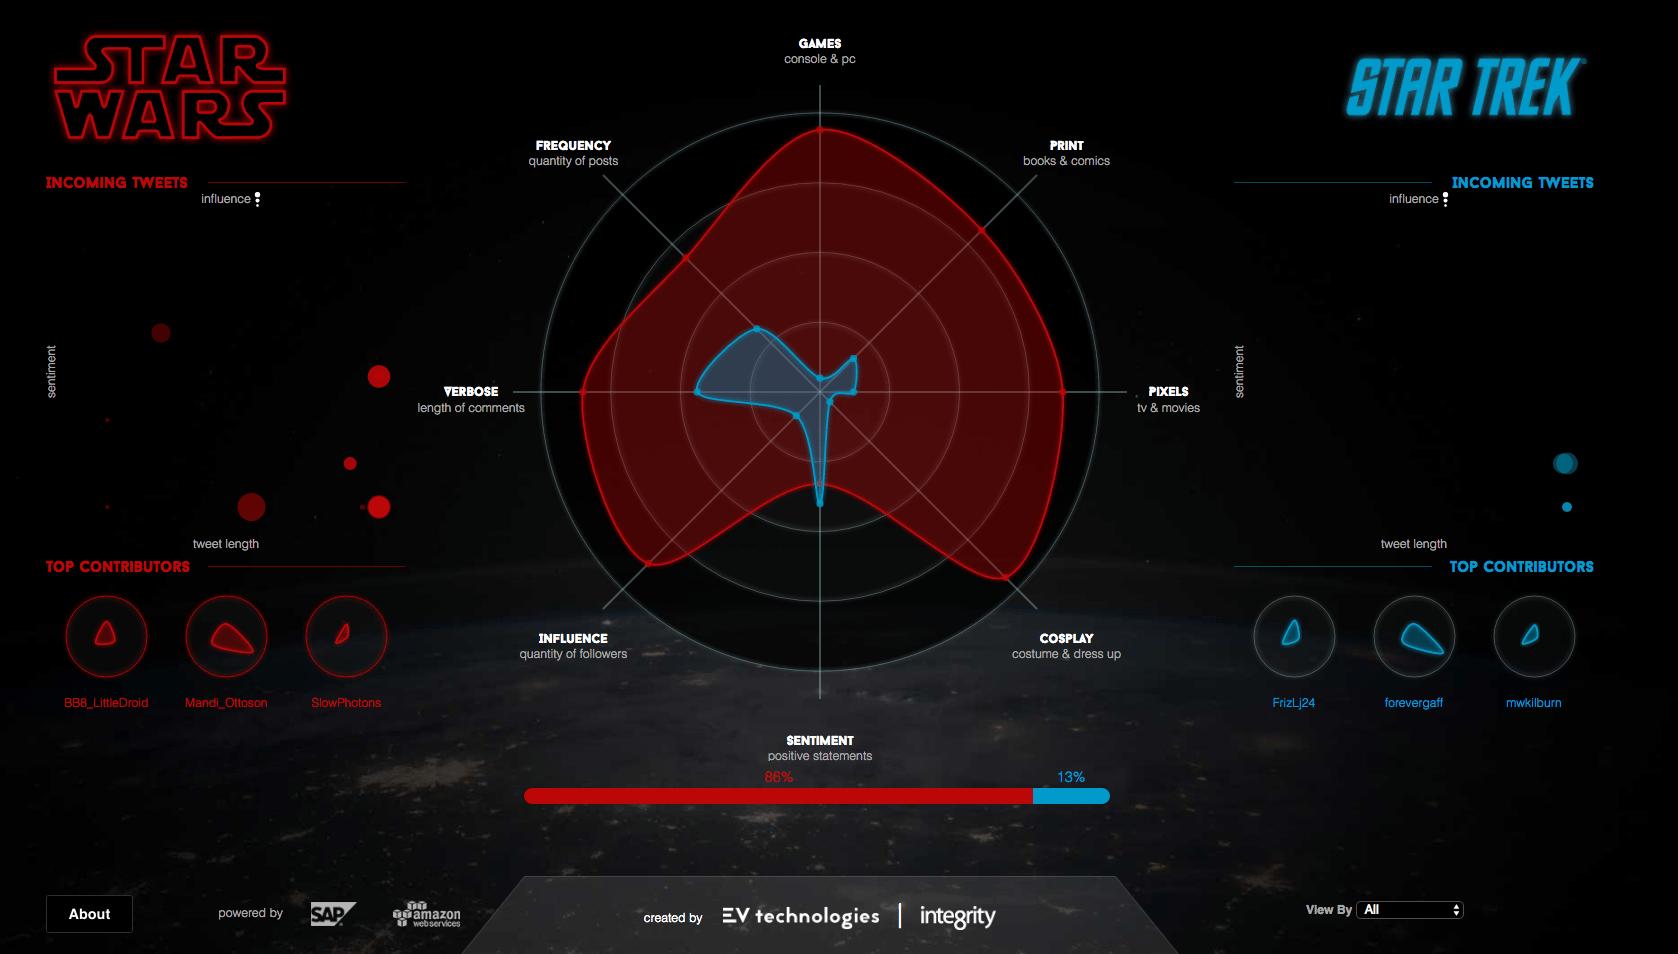 Starwars UI